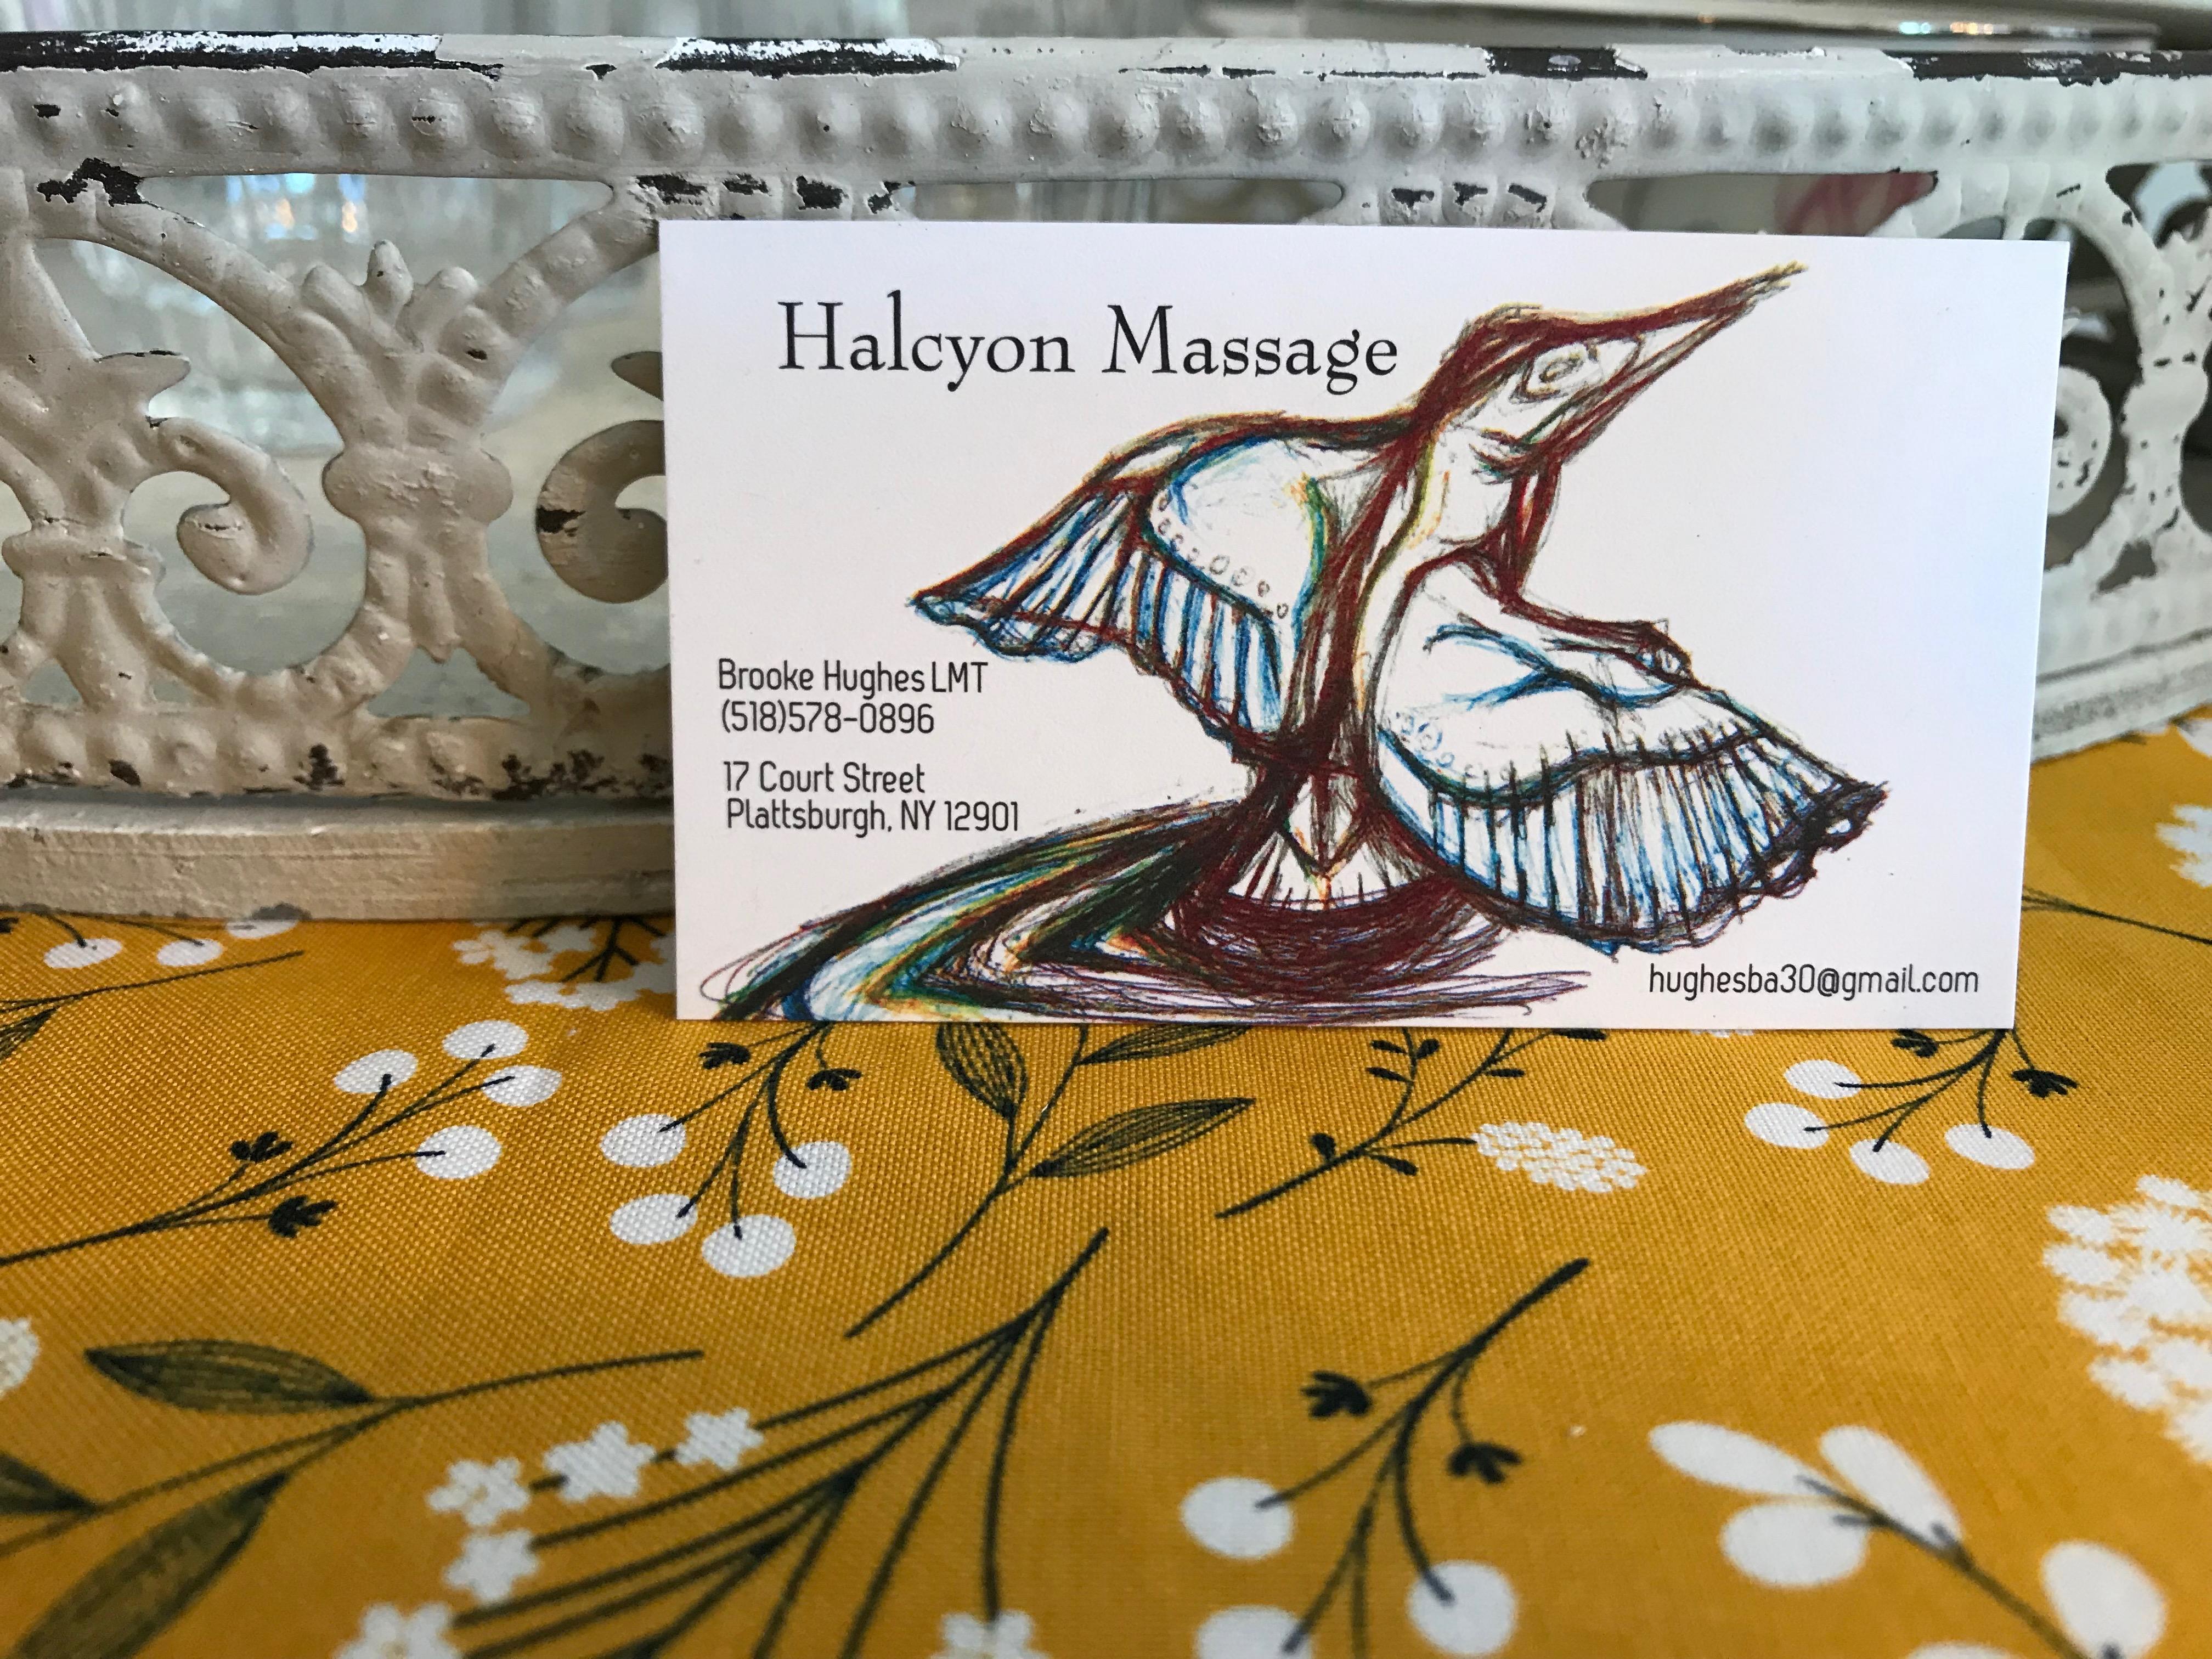 Halcyon Massage In Plattsburgh Ny